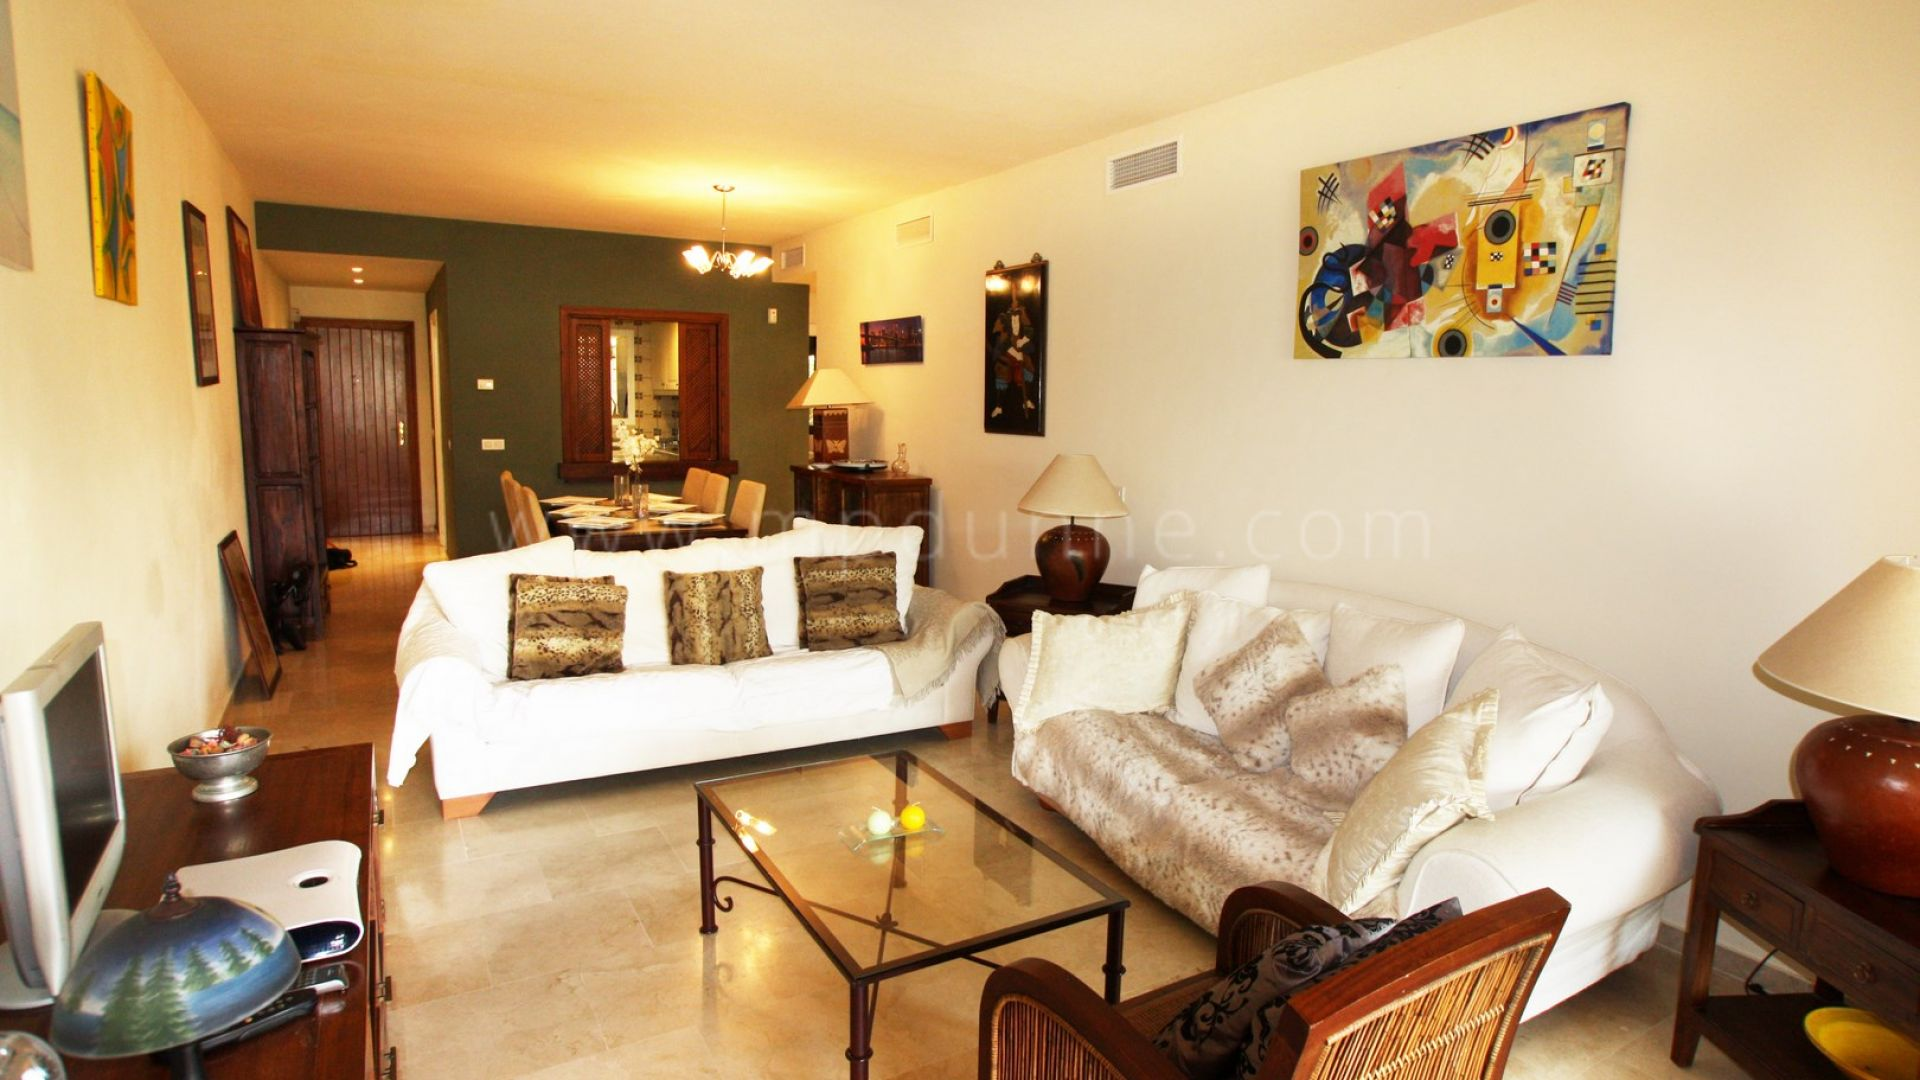 2 chambres au rez de appartement vendre el campanario estepona. Black Bedroom Furniture Sets. Home Design Ideas